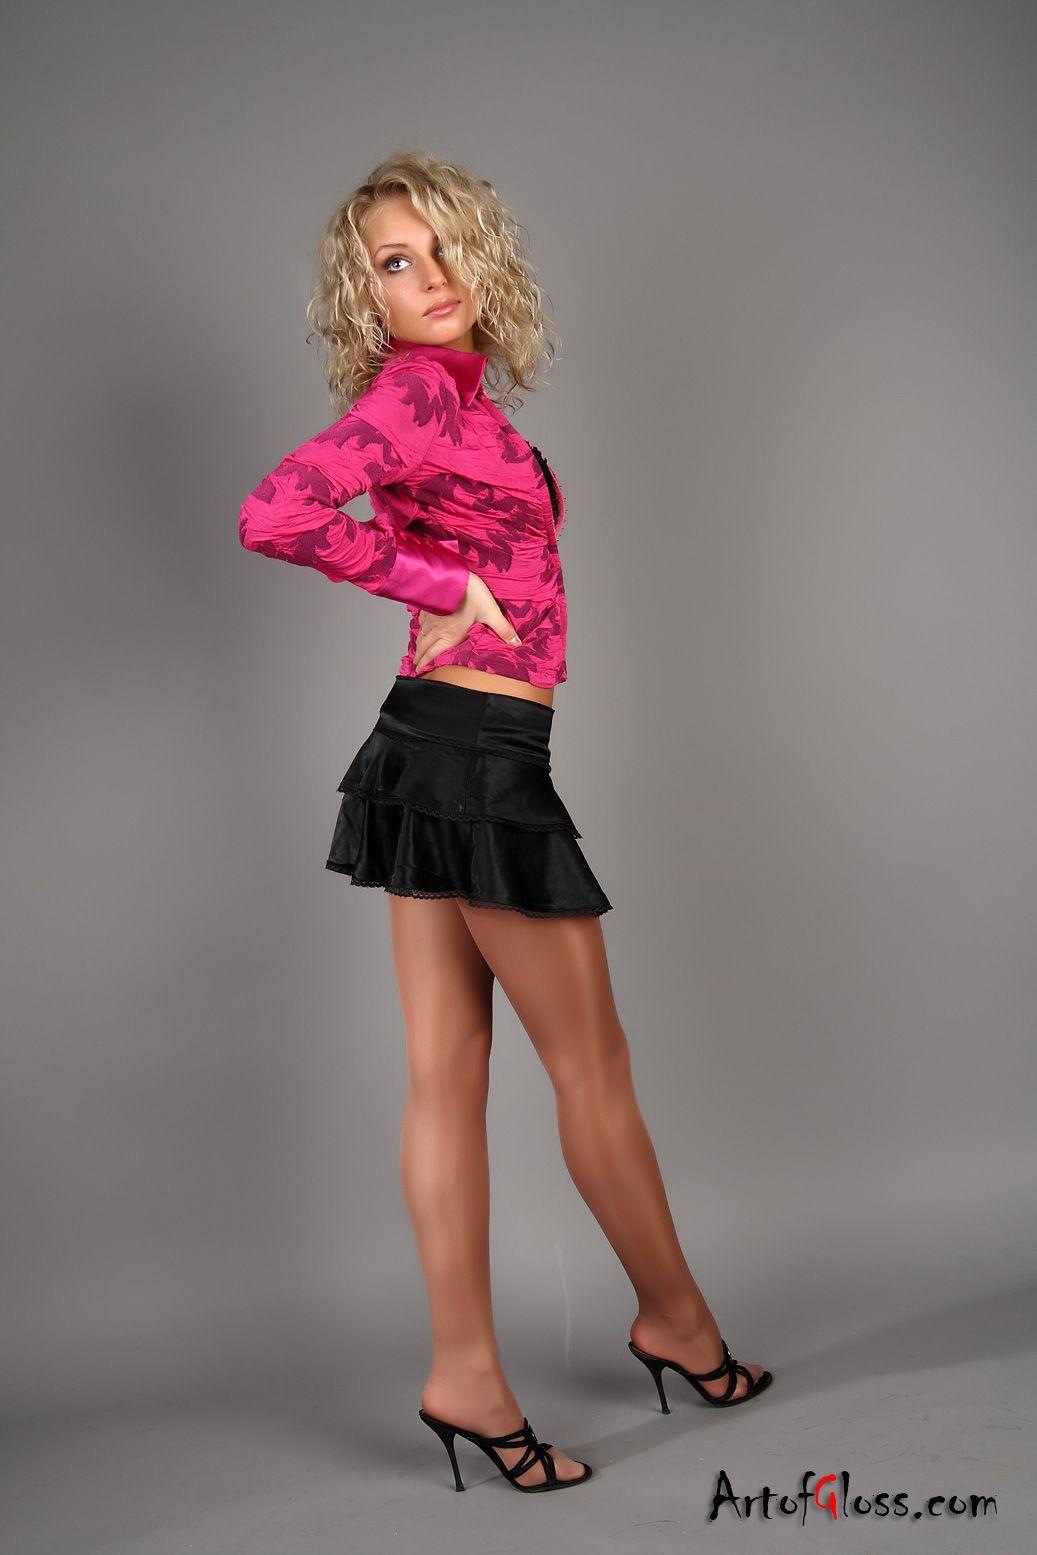 ArtOfGloss | Mini skirts | Pinterest